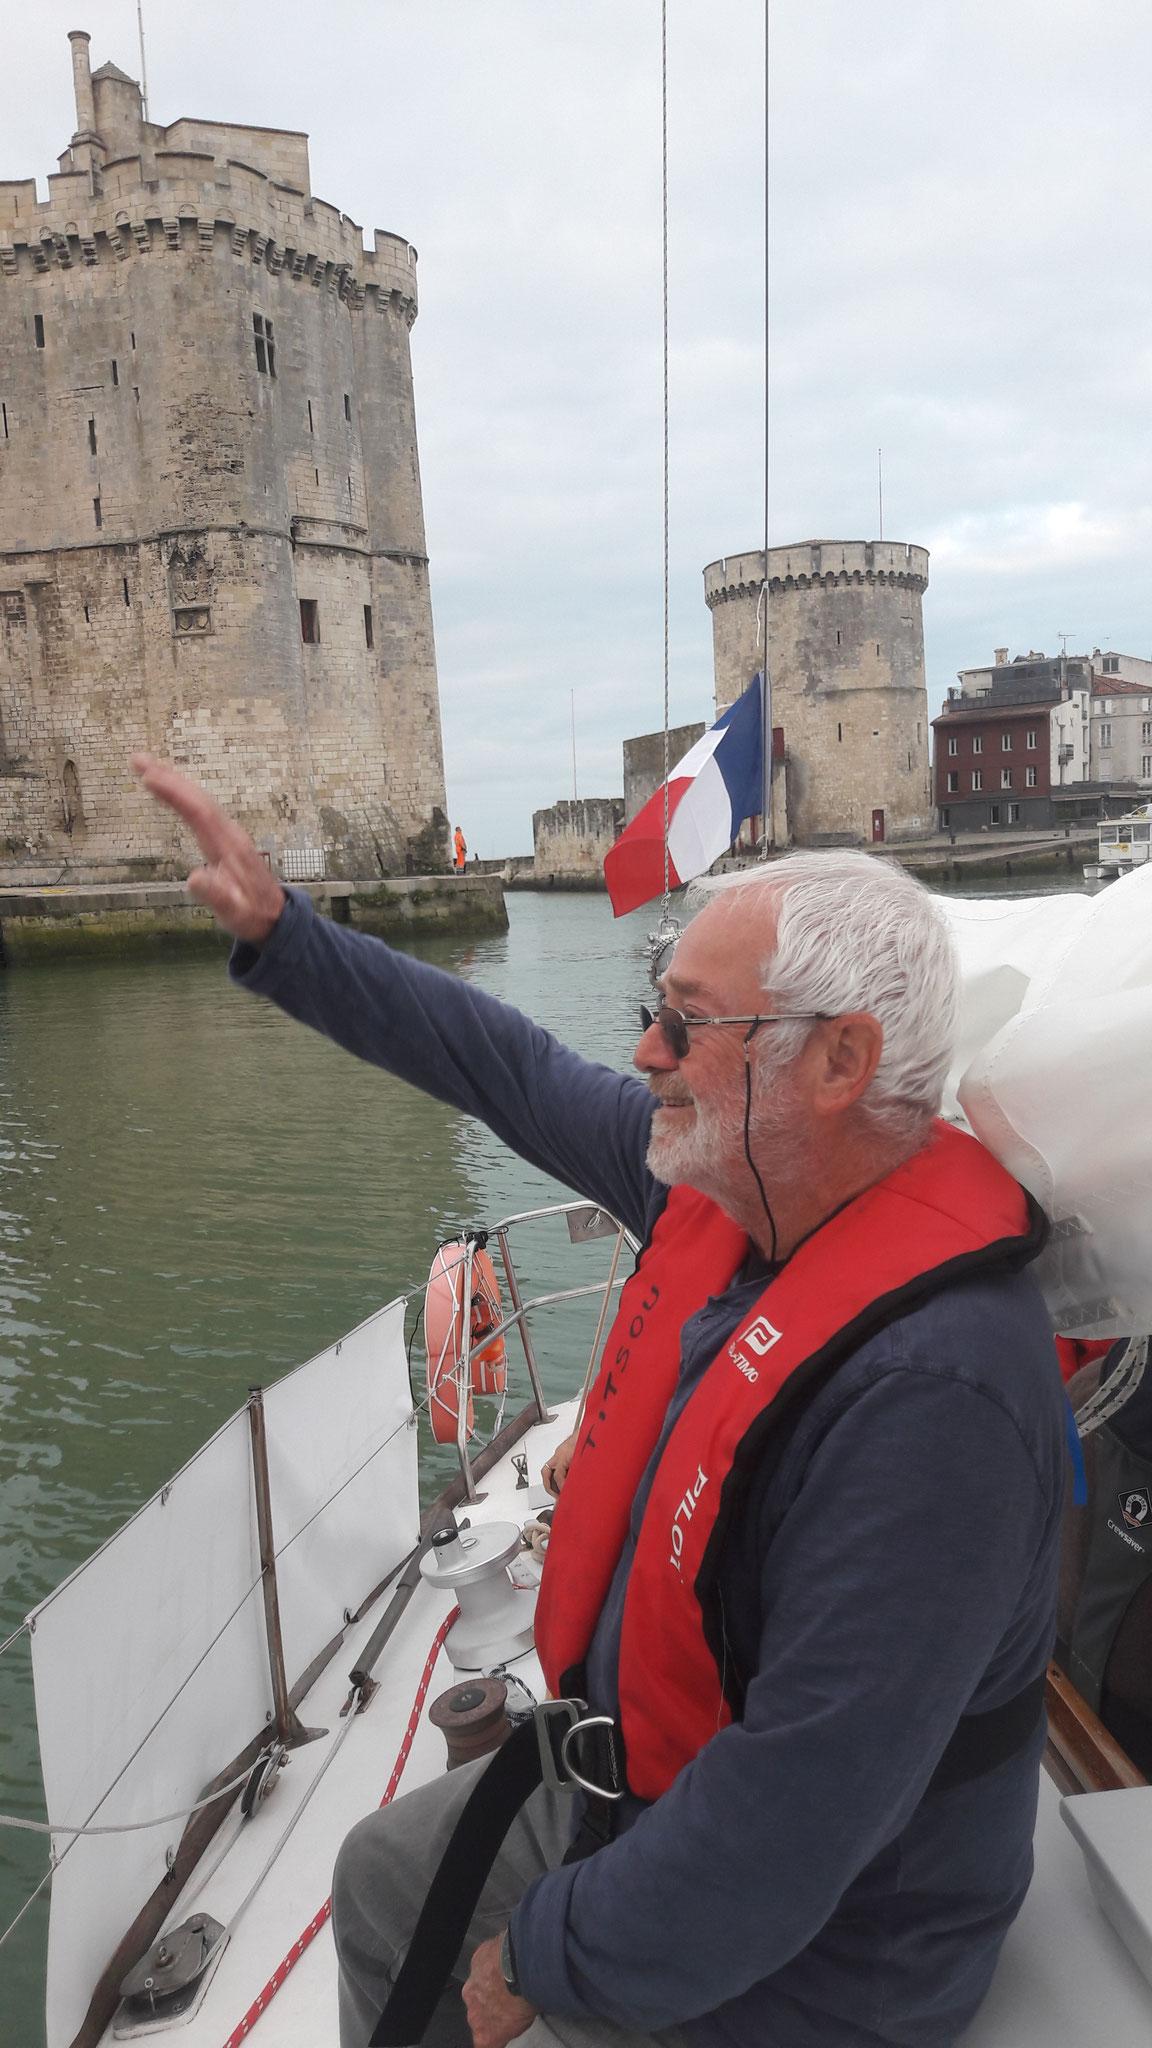 Jean-Alain Berlaud